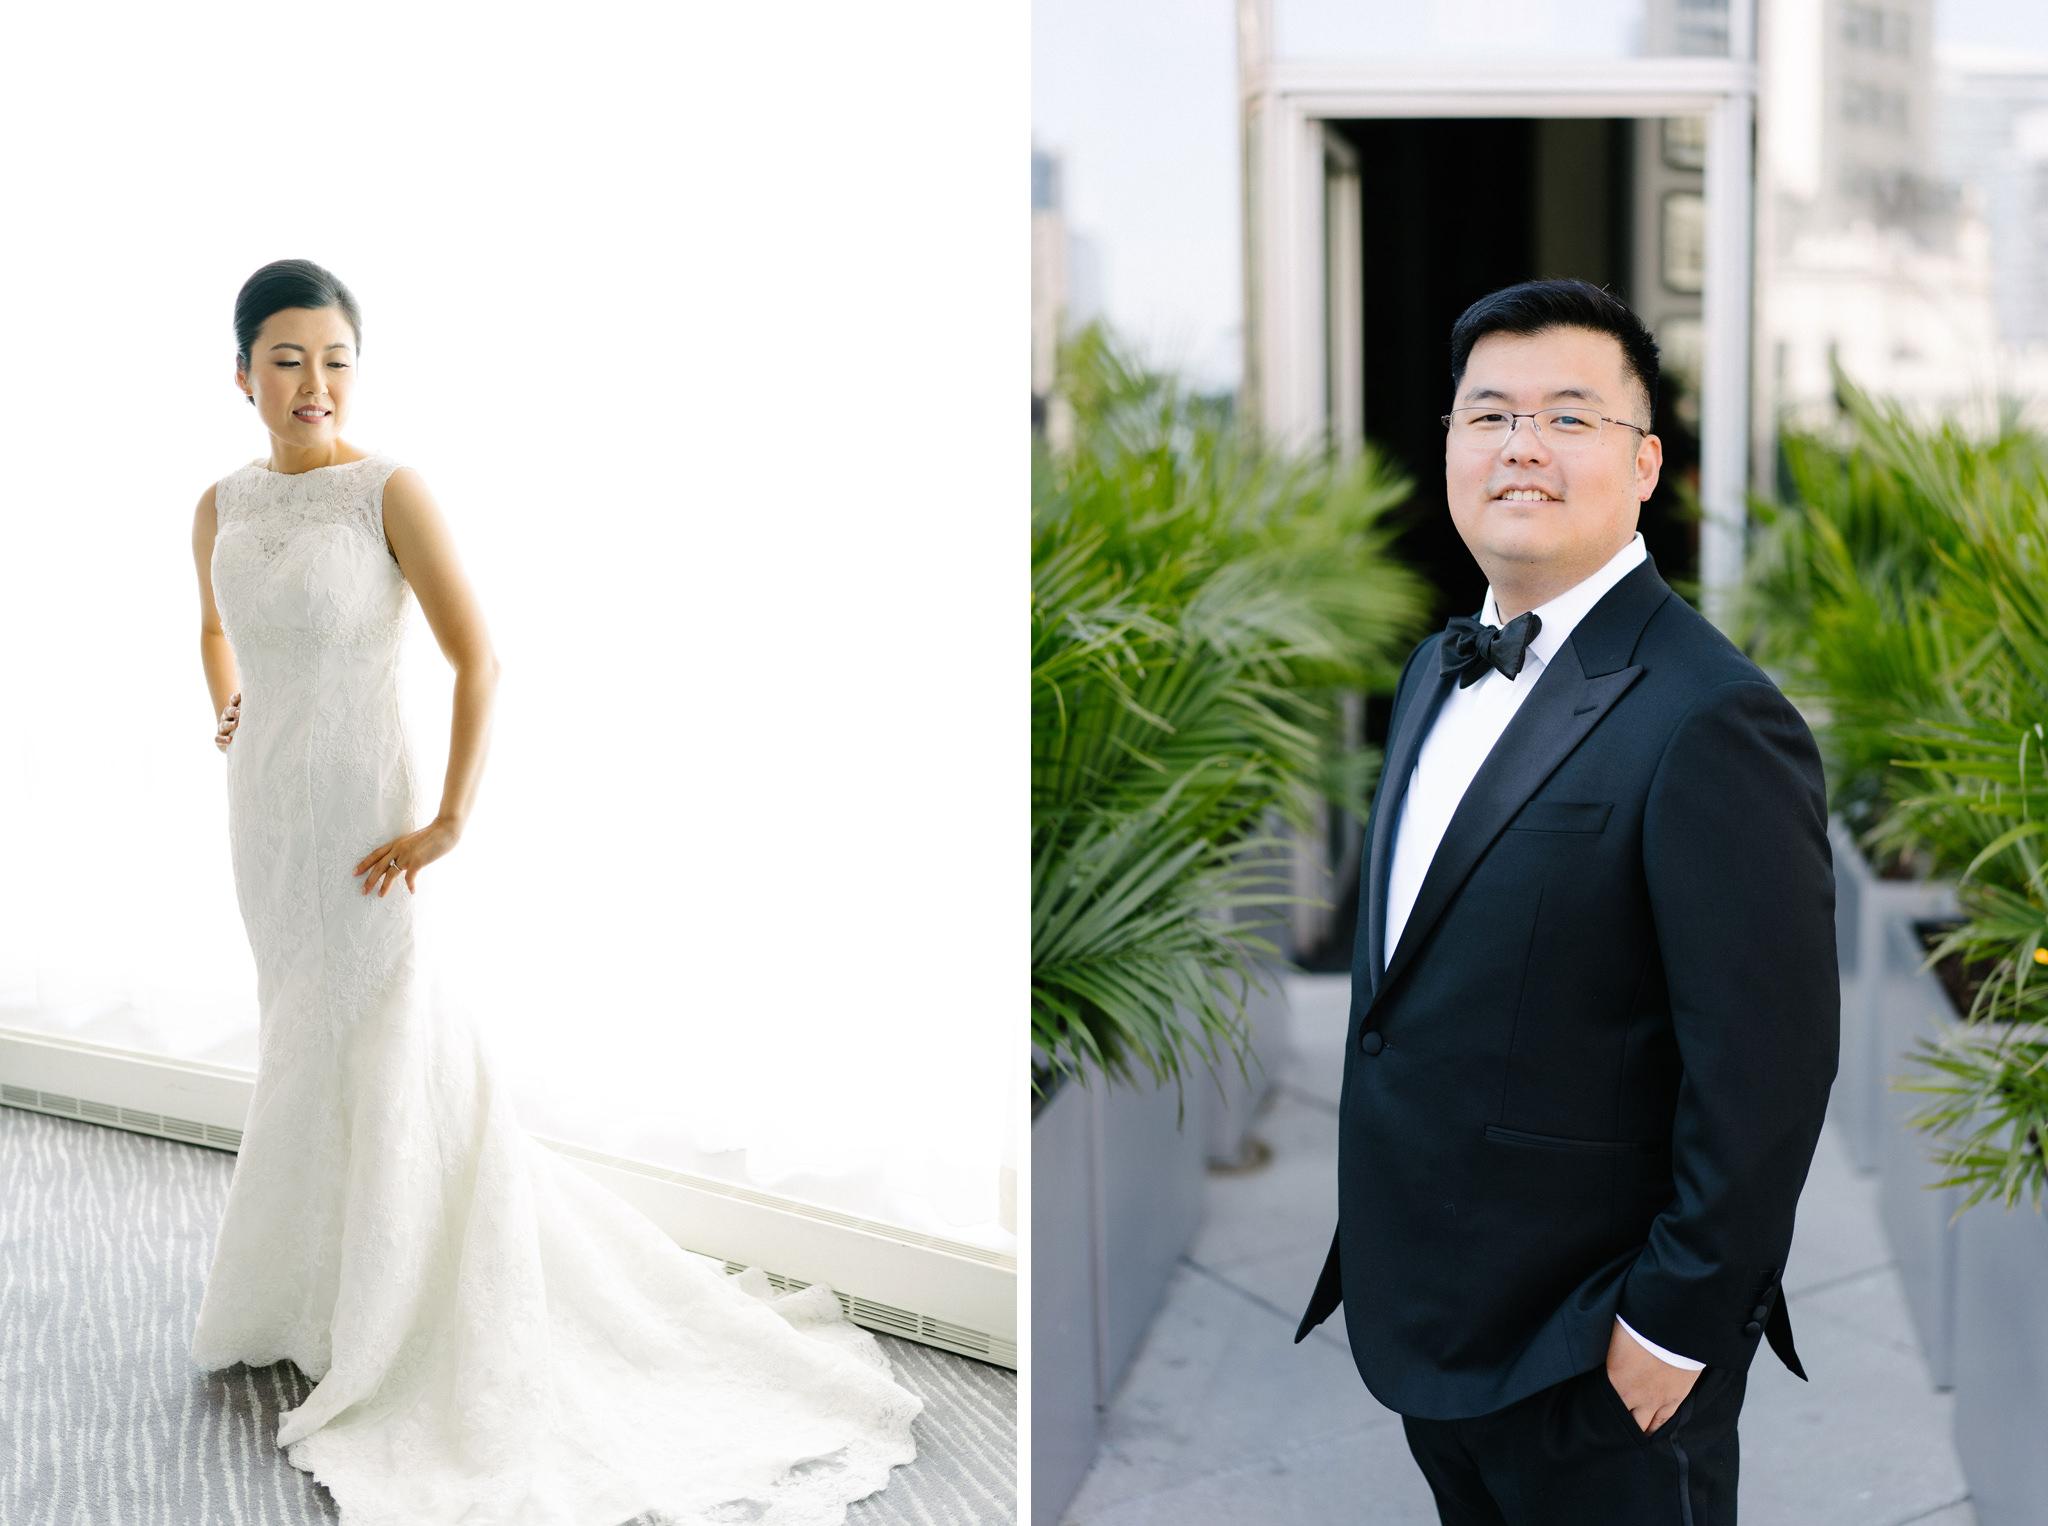 005-rempel-photography-chicago-wedding-inspiration-sara-philip-rockefeller-chapel-trump-tower.jpg